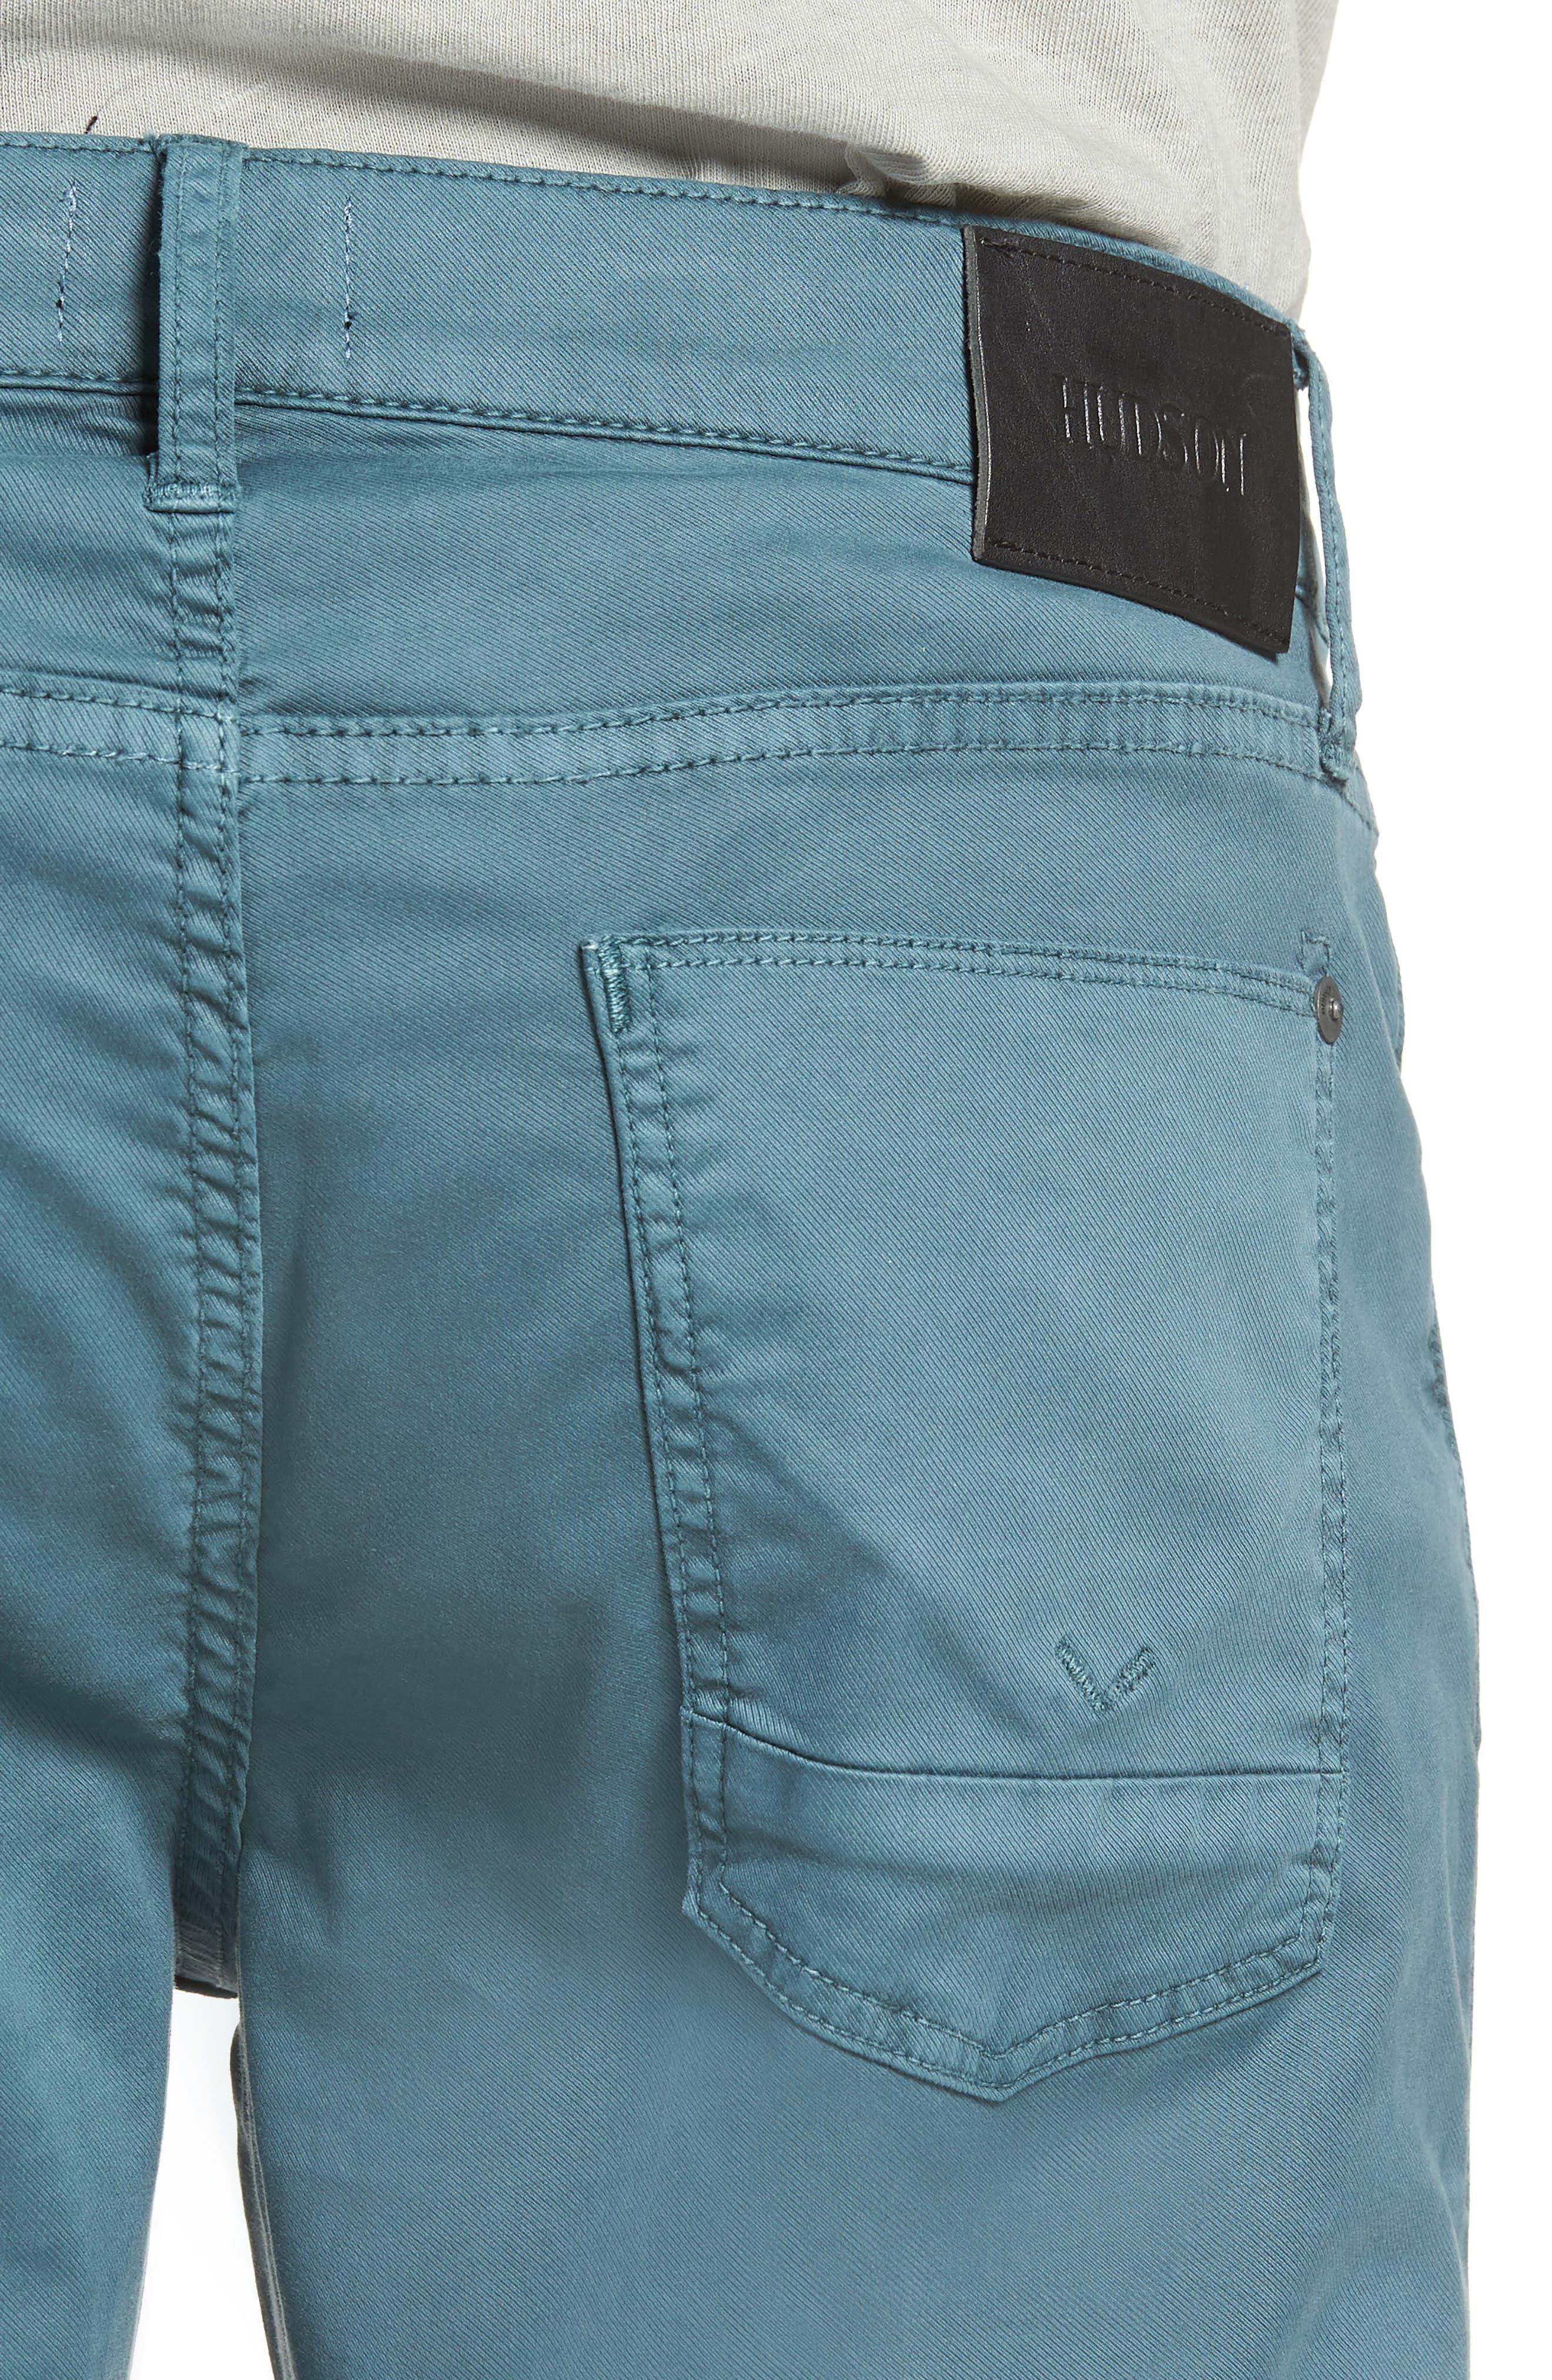 Blake Slim Fit Jeans,                             Alternate thumbnail 4, color,                             Ocean